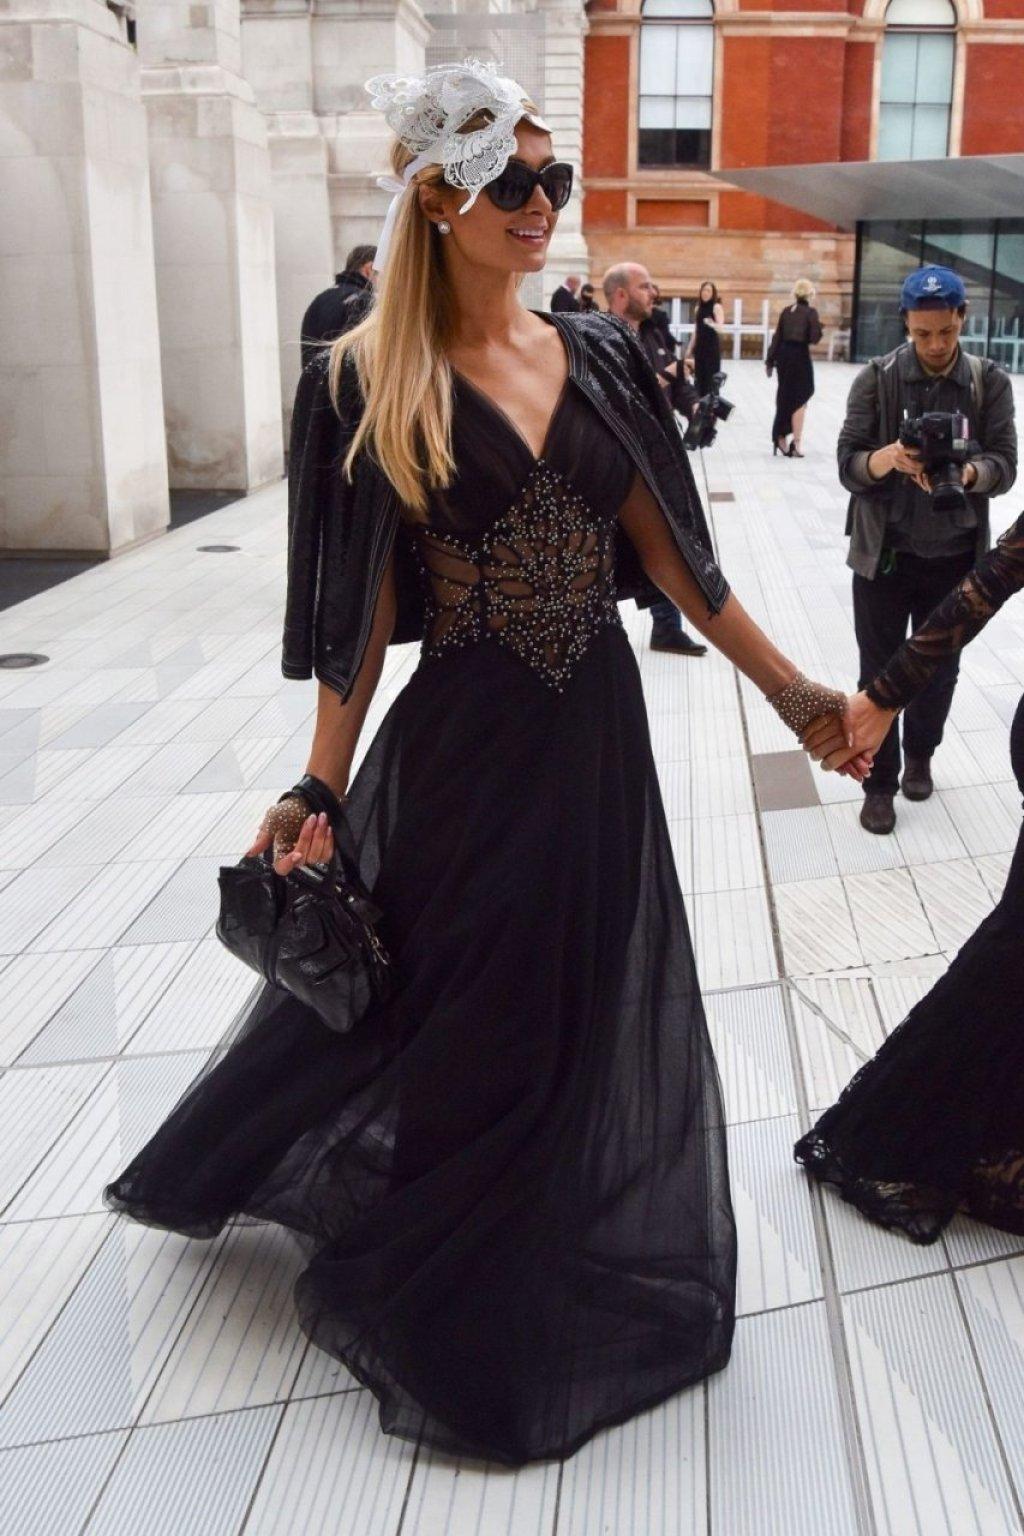 Paris Hilton See Through (99 Photos)